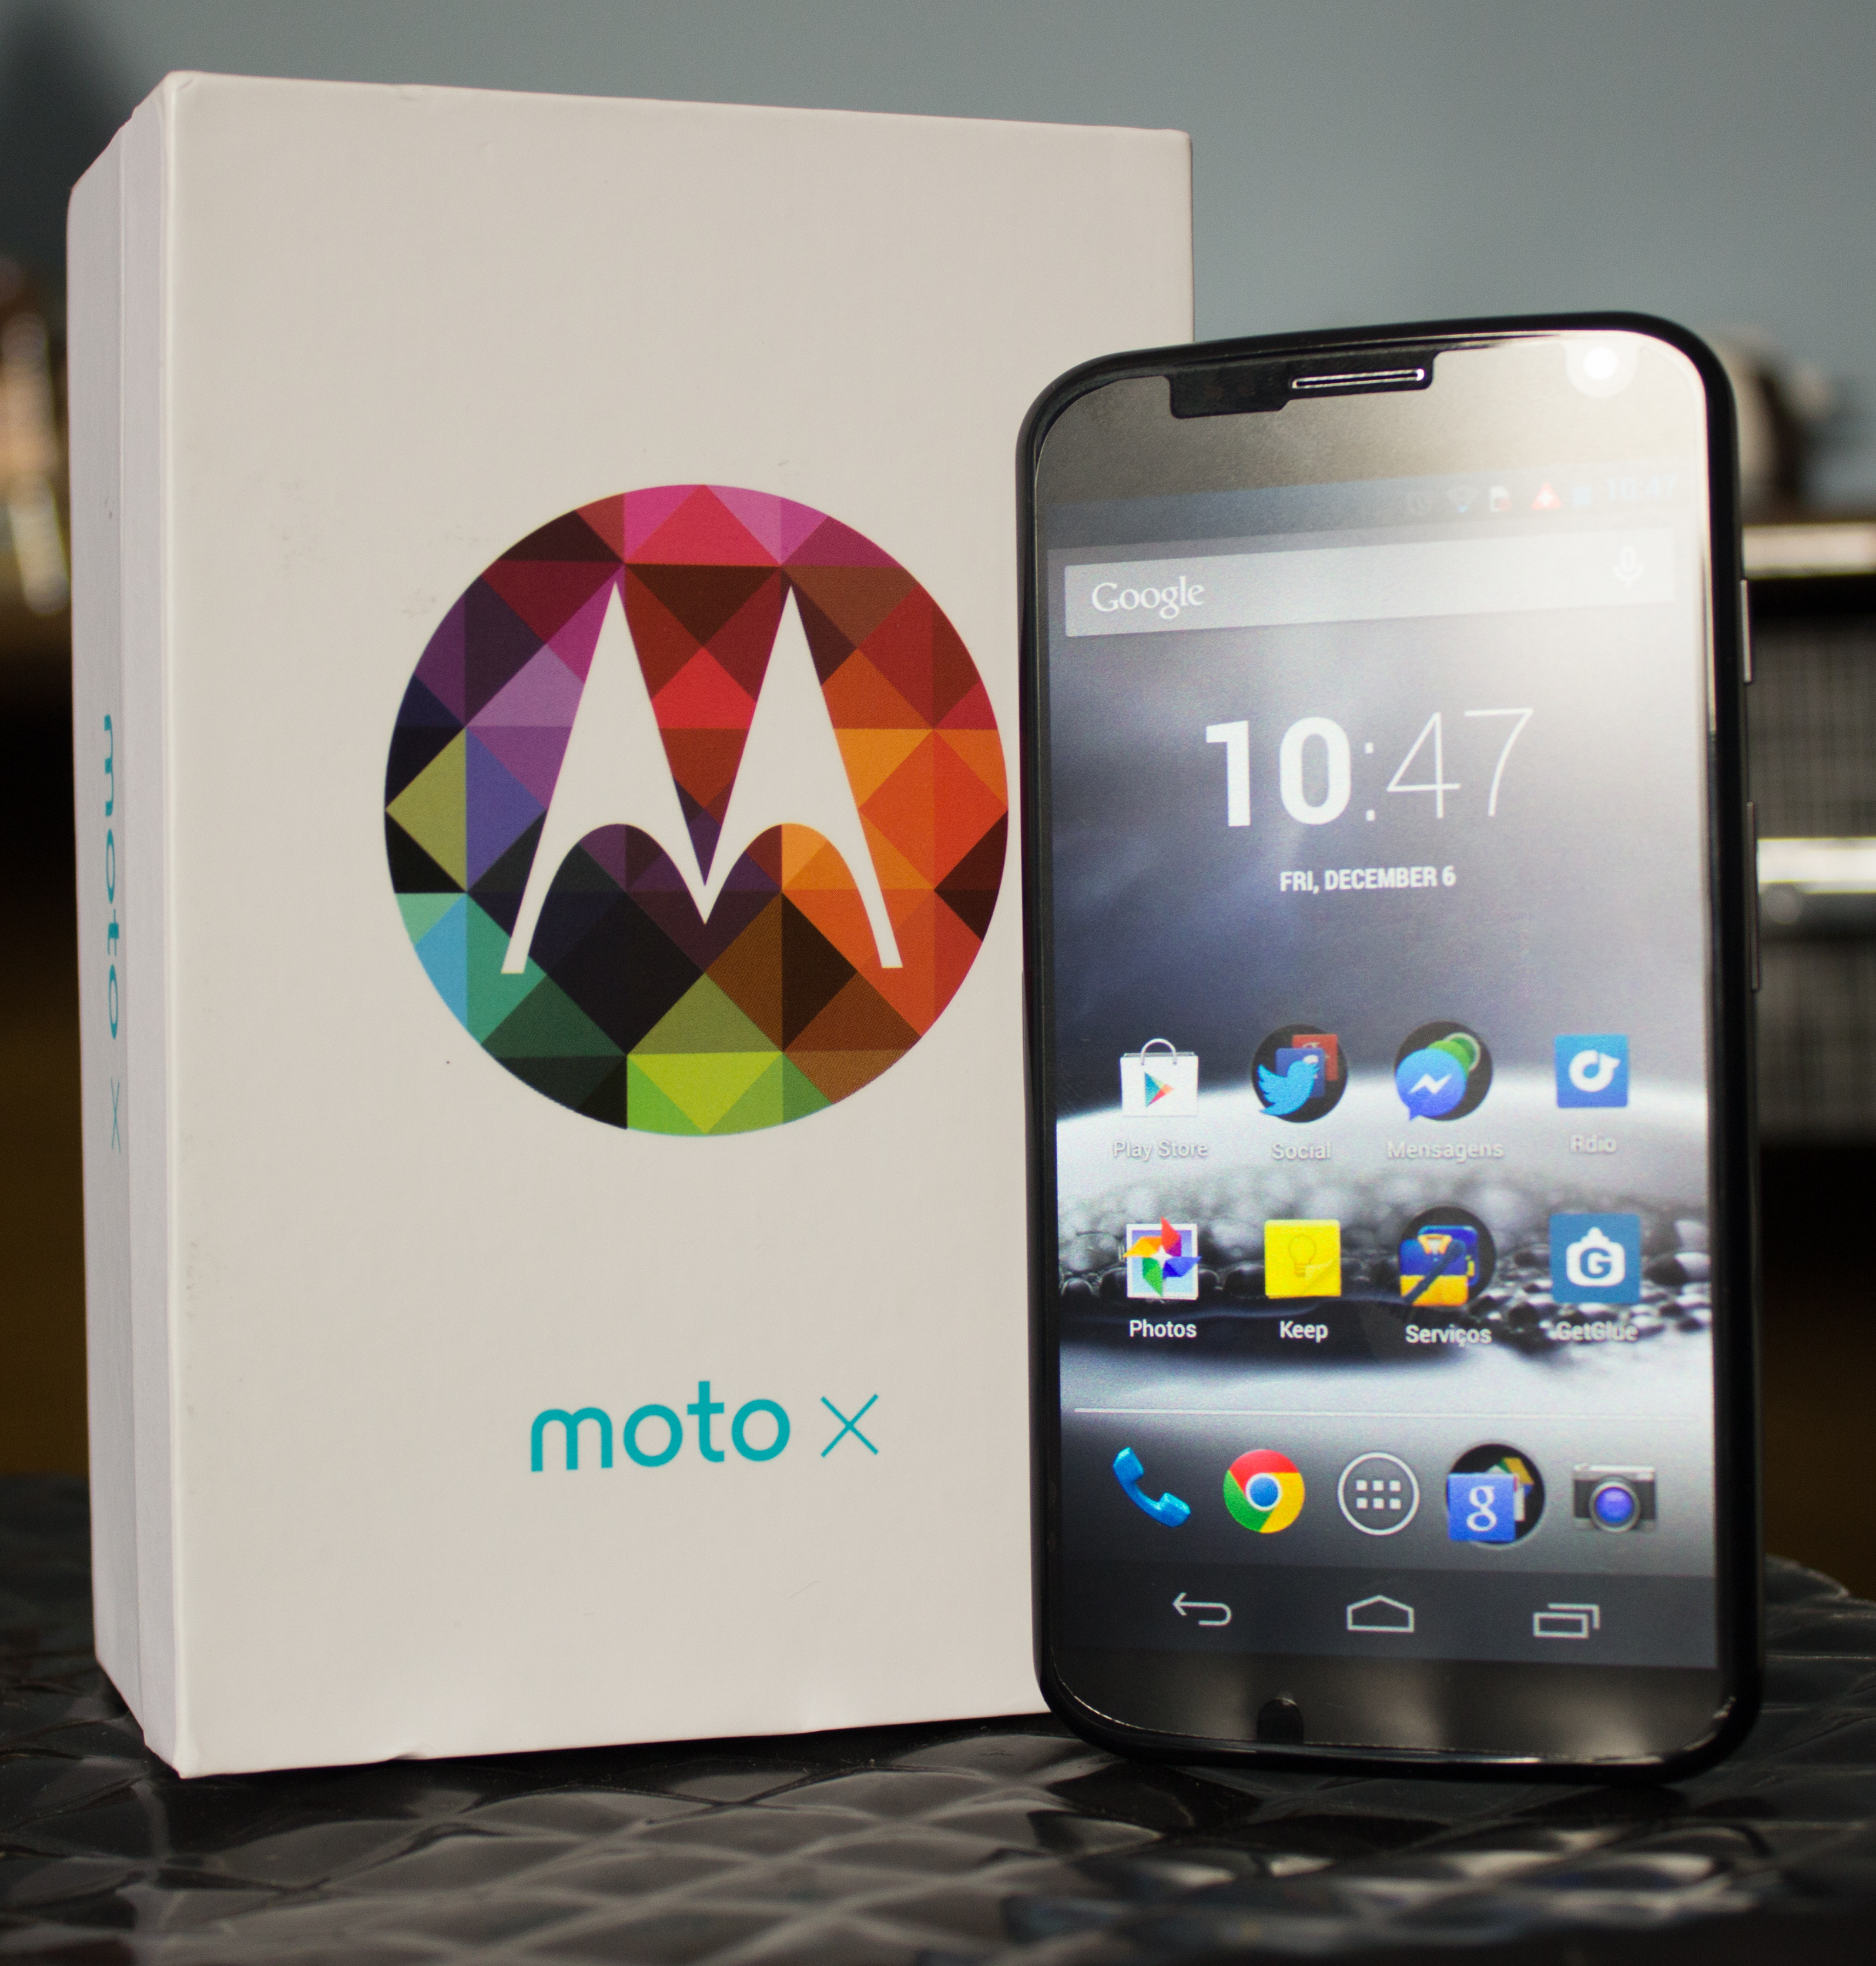 Moto X 1st Generation